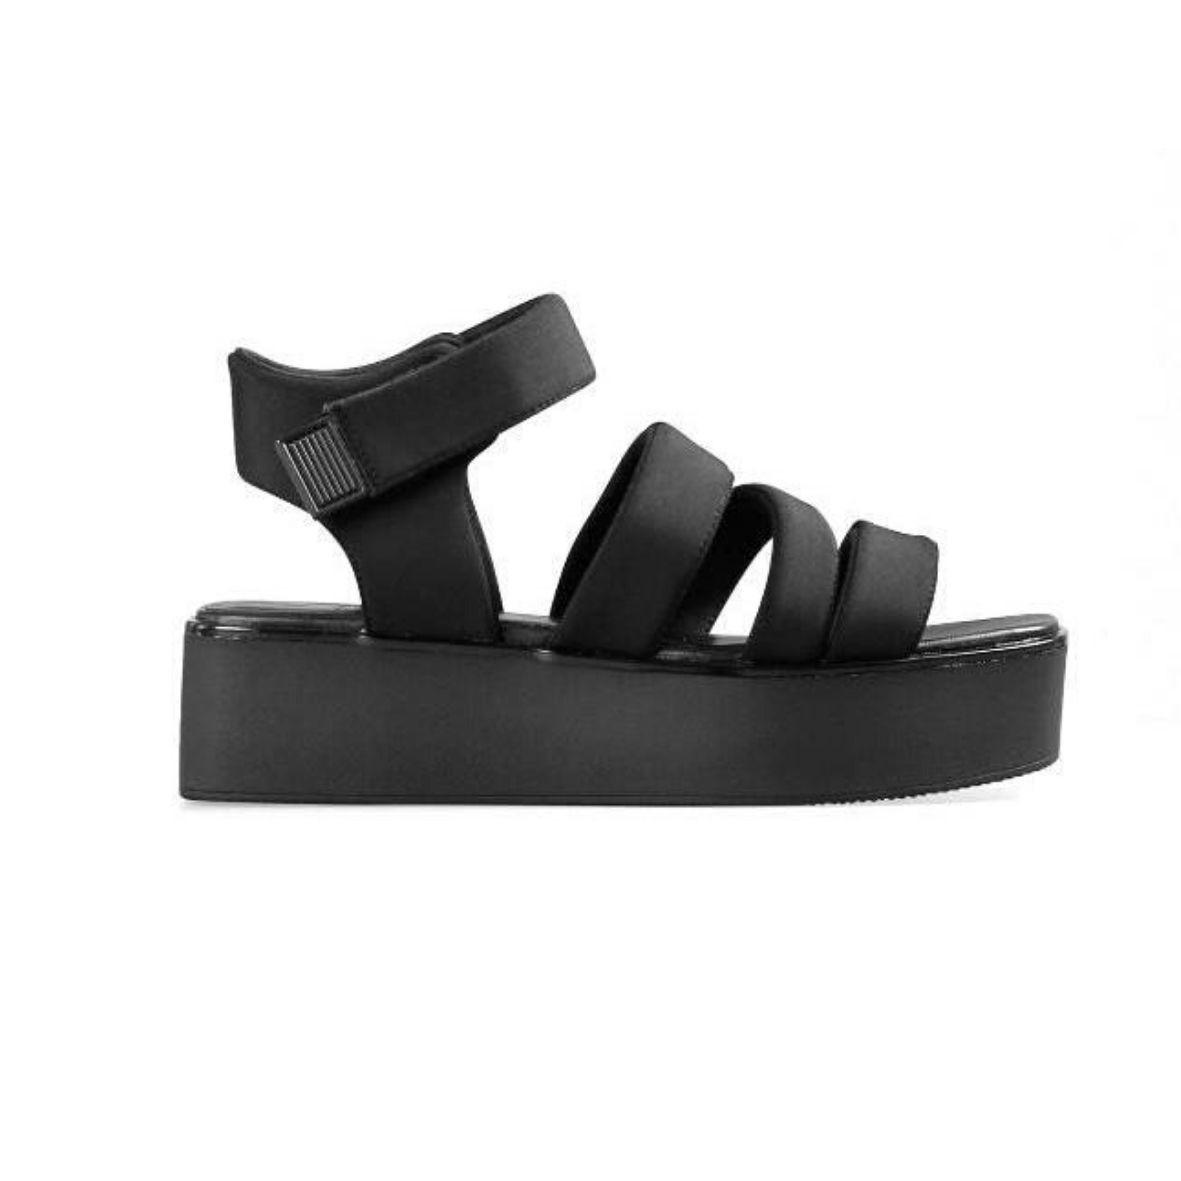 Bonnie strappy Platform Sandal